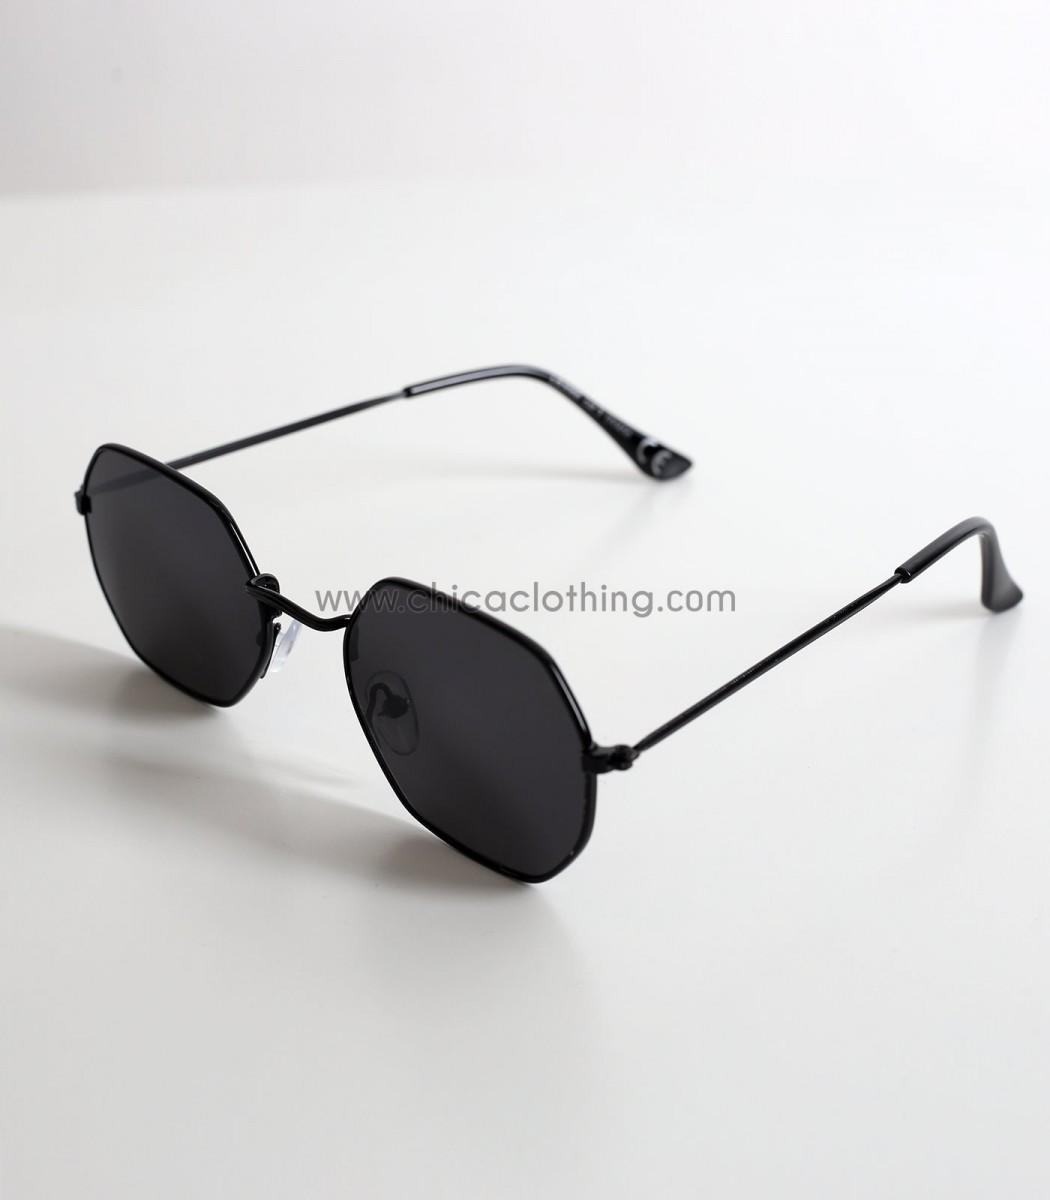 b94f0a5767 Γυναικεία γυαλιά ηλίου με πολύγωνο σκελετό και μαύρο φακό